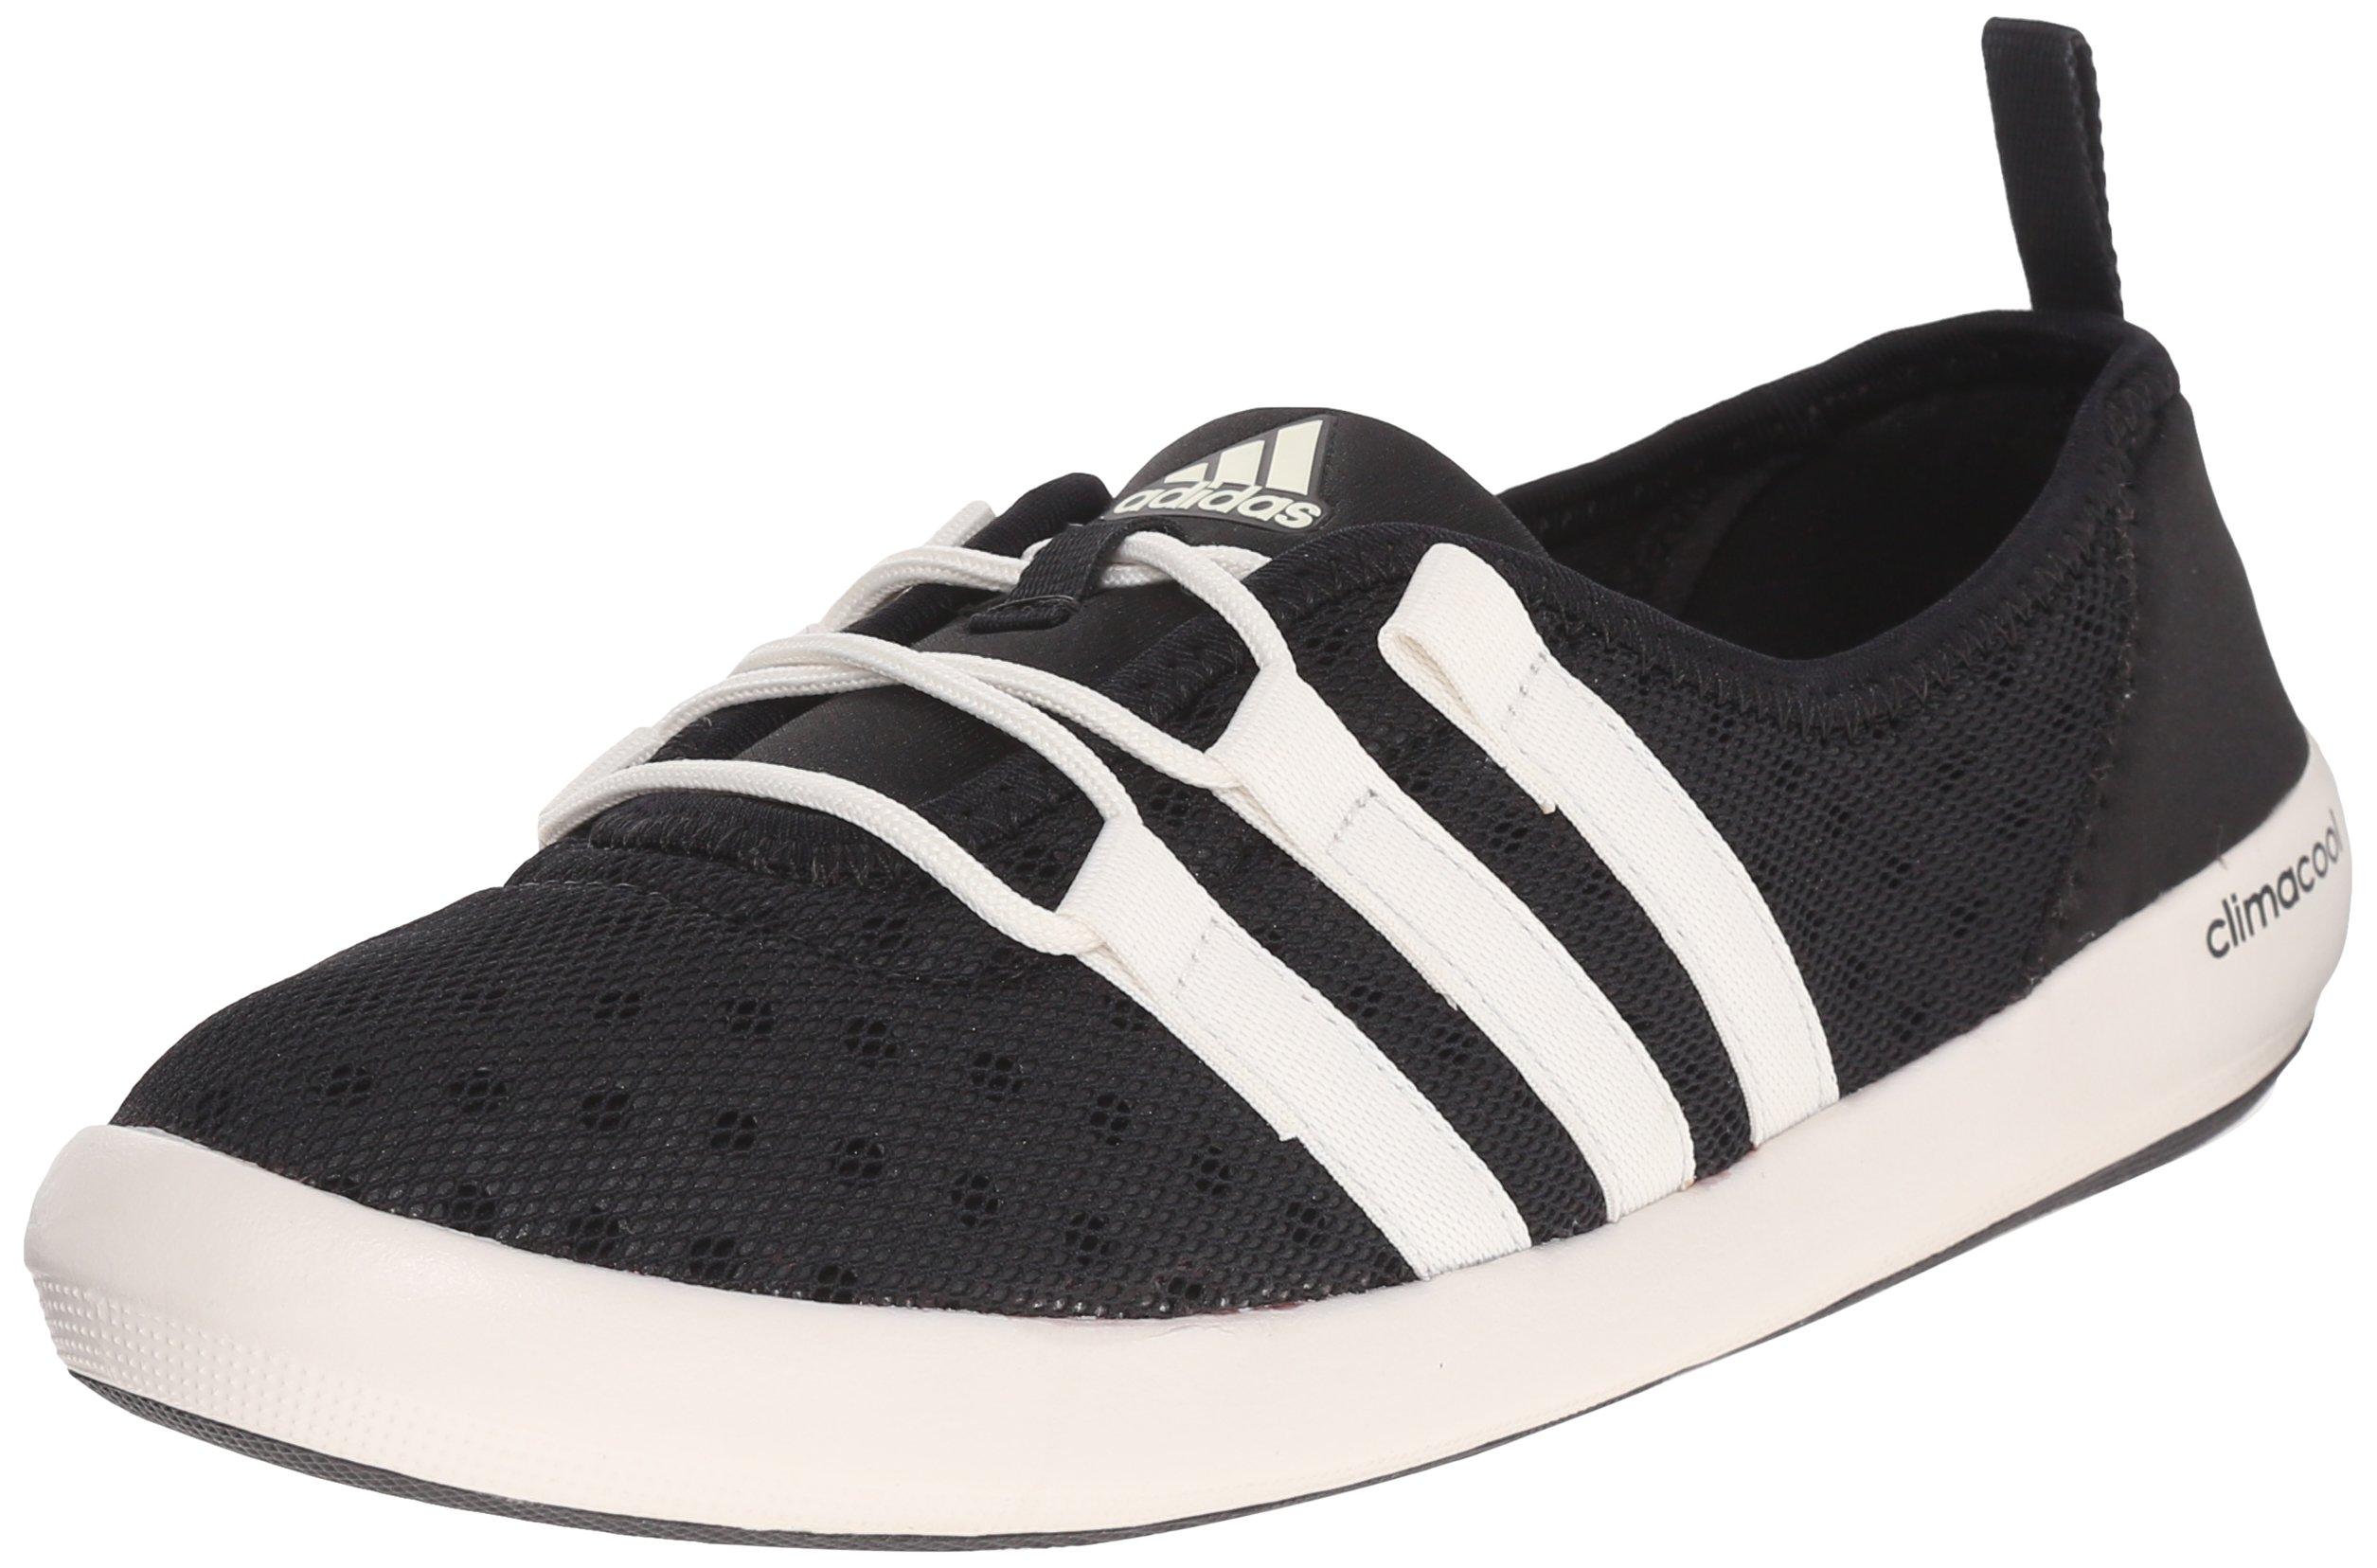 adidas outdoor Women's Climacool Boat Sleek Water Shoe, Black/chalk White/Black, 11 M US